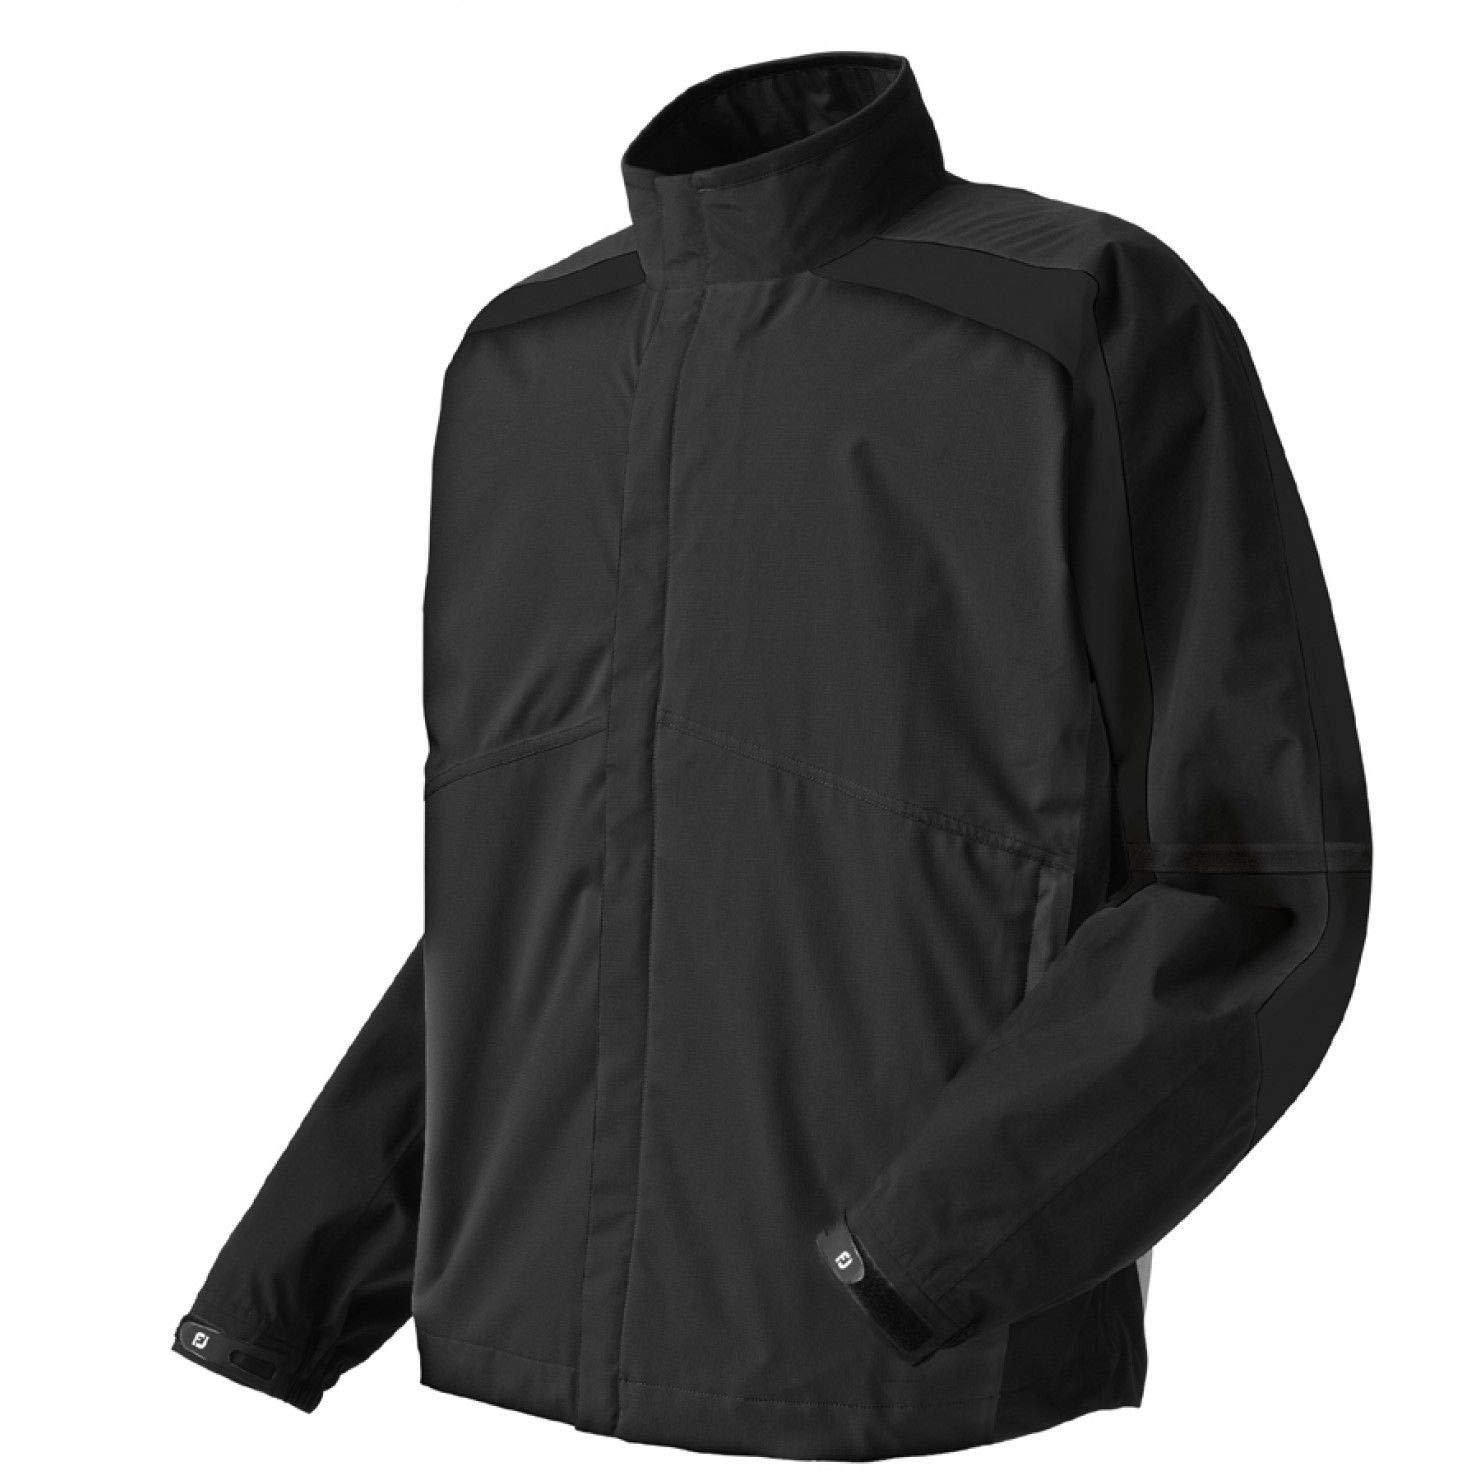 FootJoy Hydrolite Rain Golf Jacket 2017 Black Small